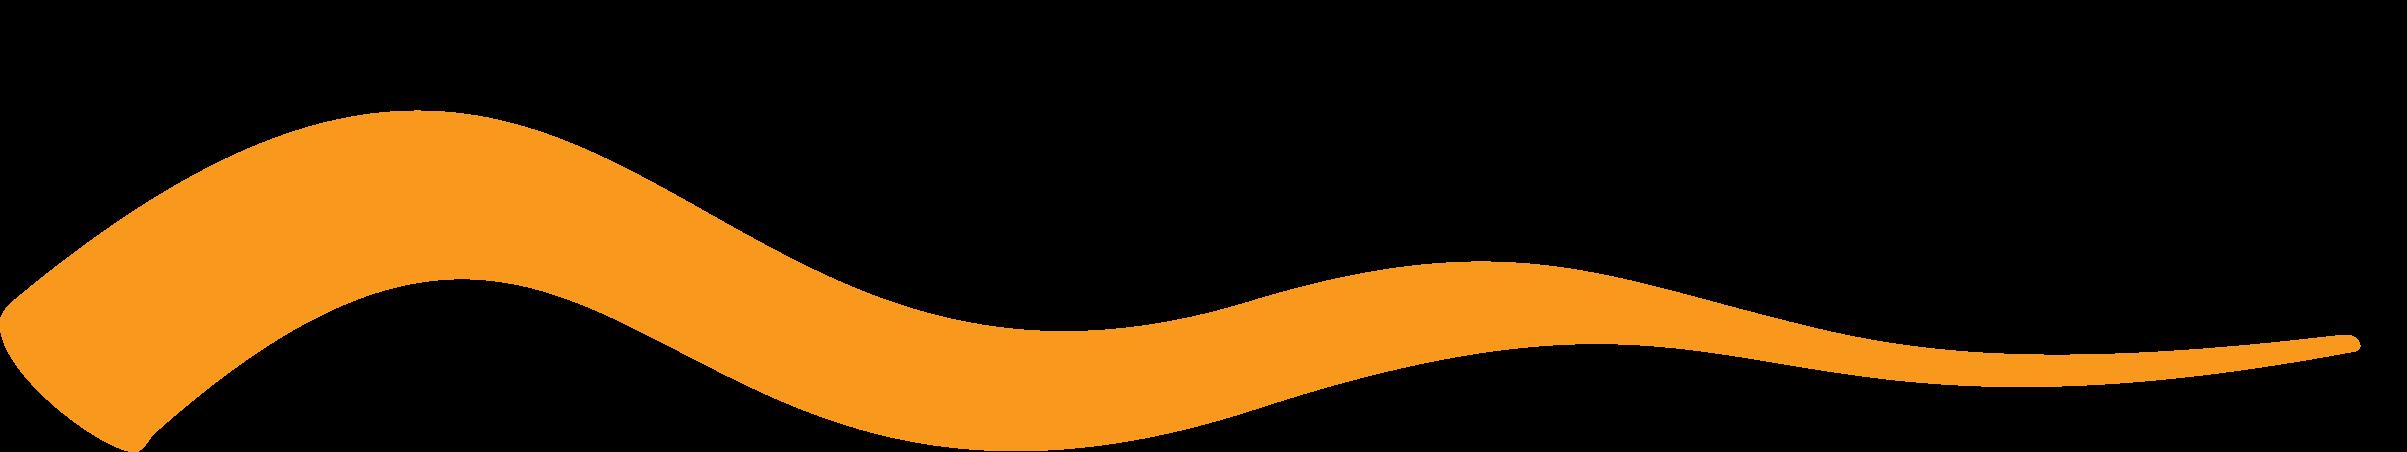 Realflow logo